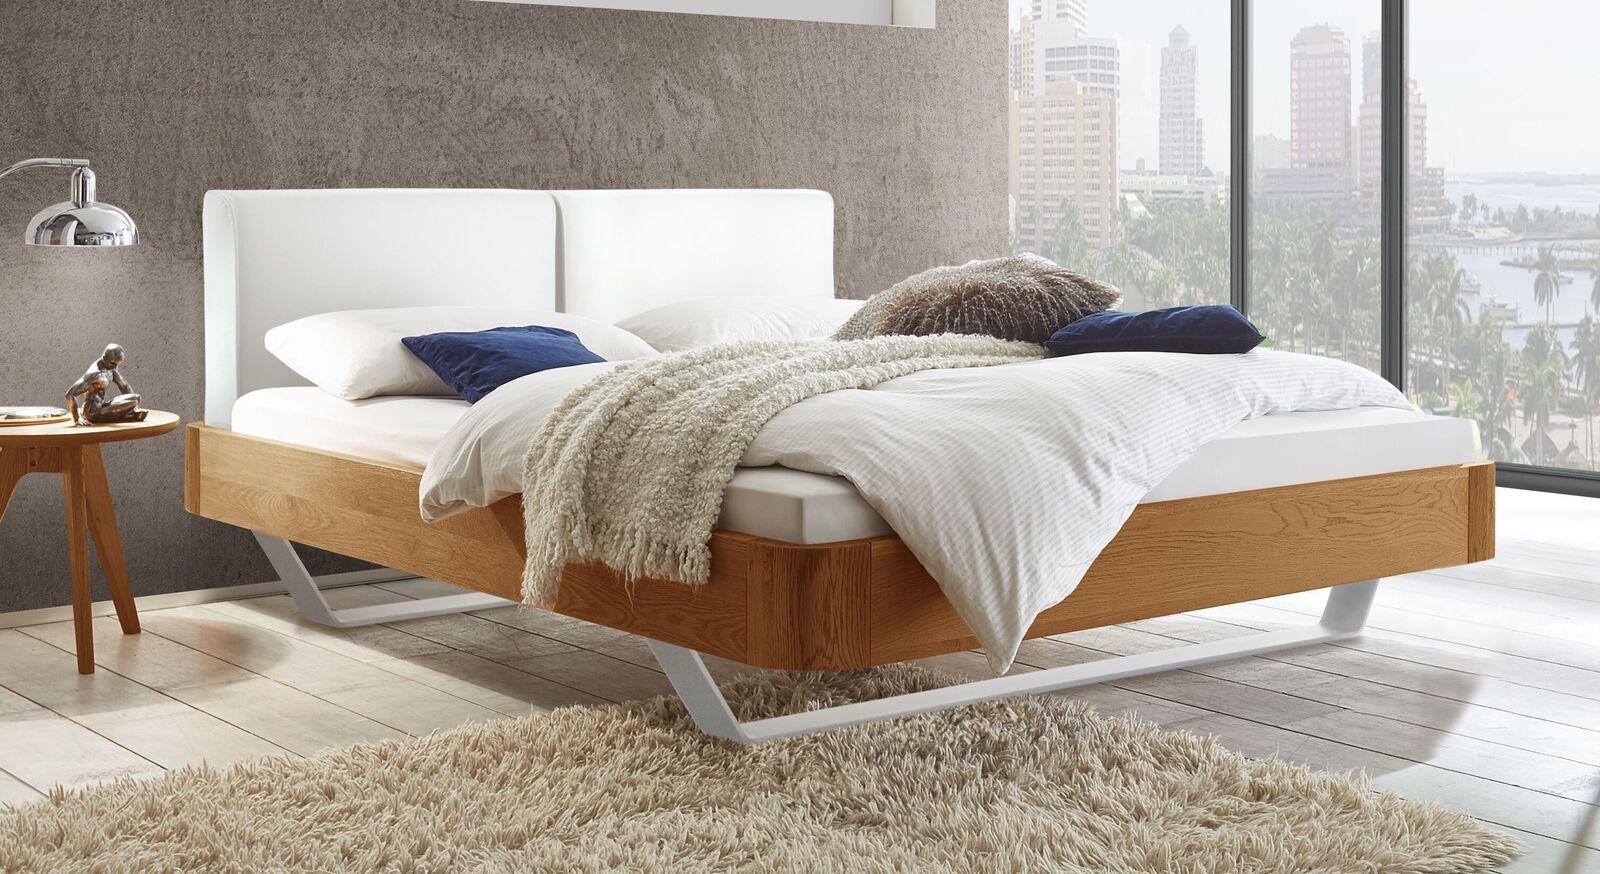 Stabiles Bett Poncas aus Eichenholz